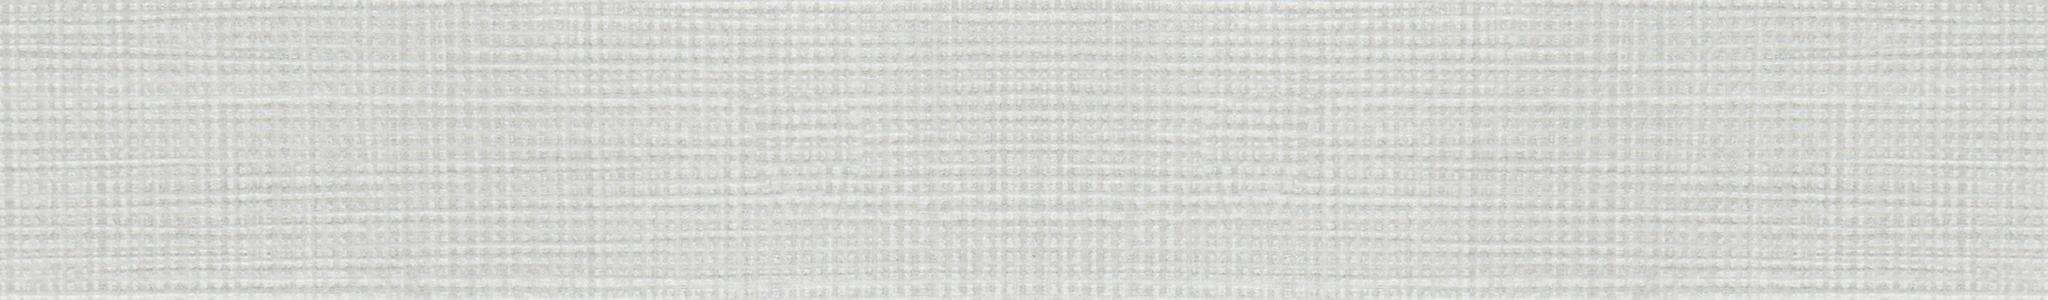 HD 29426 ABS Edge Grey Canvas Pore